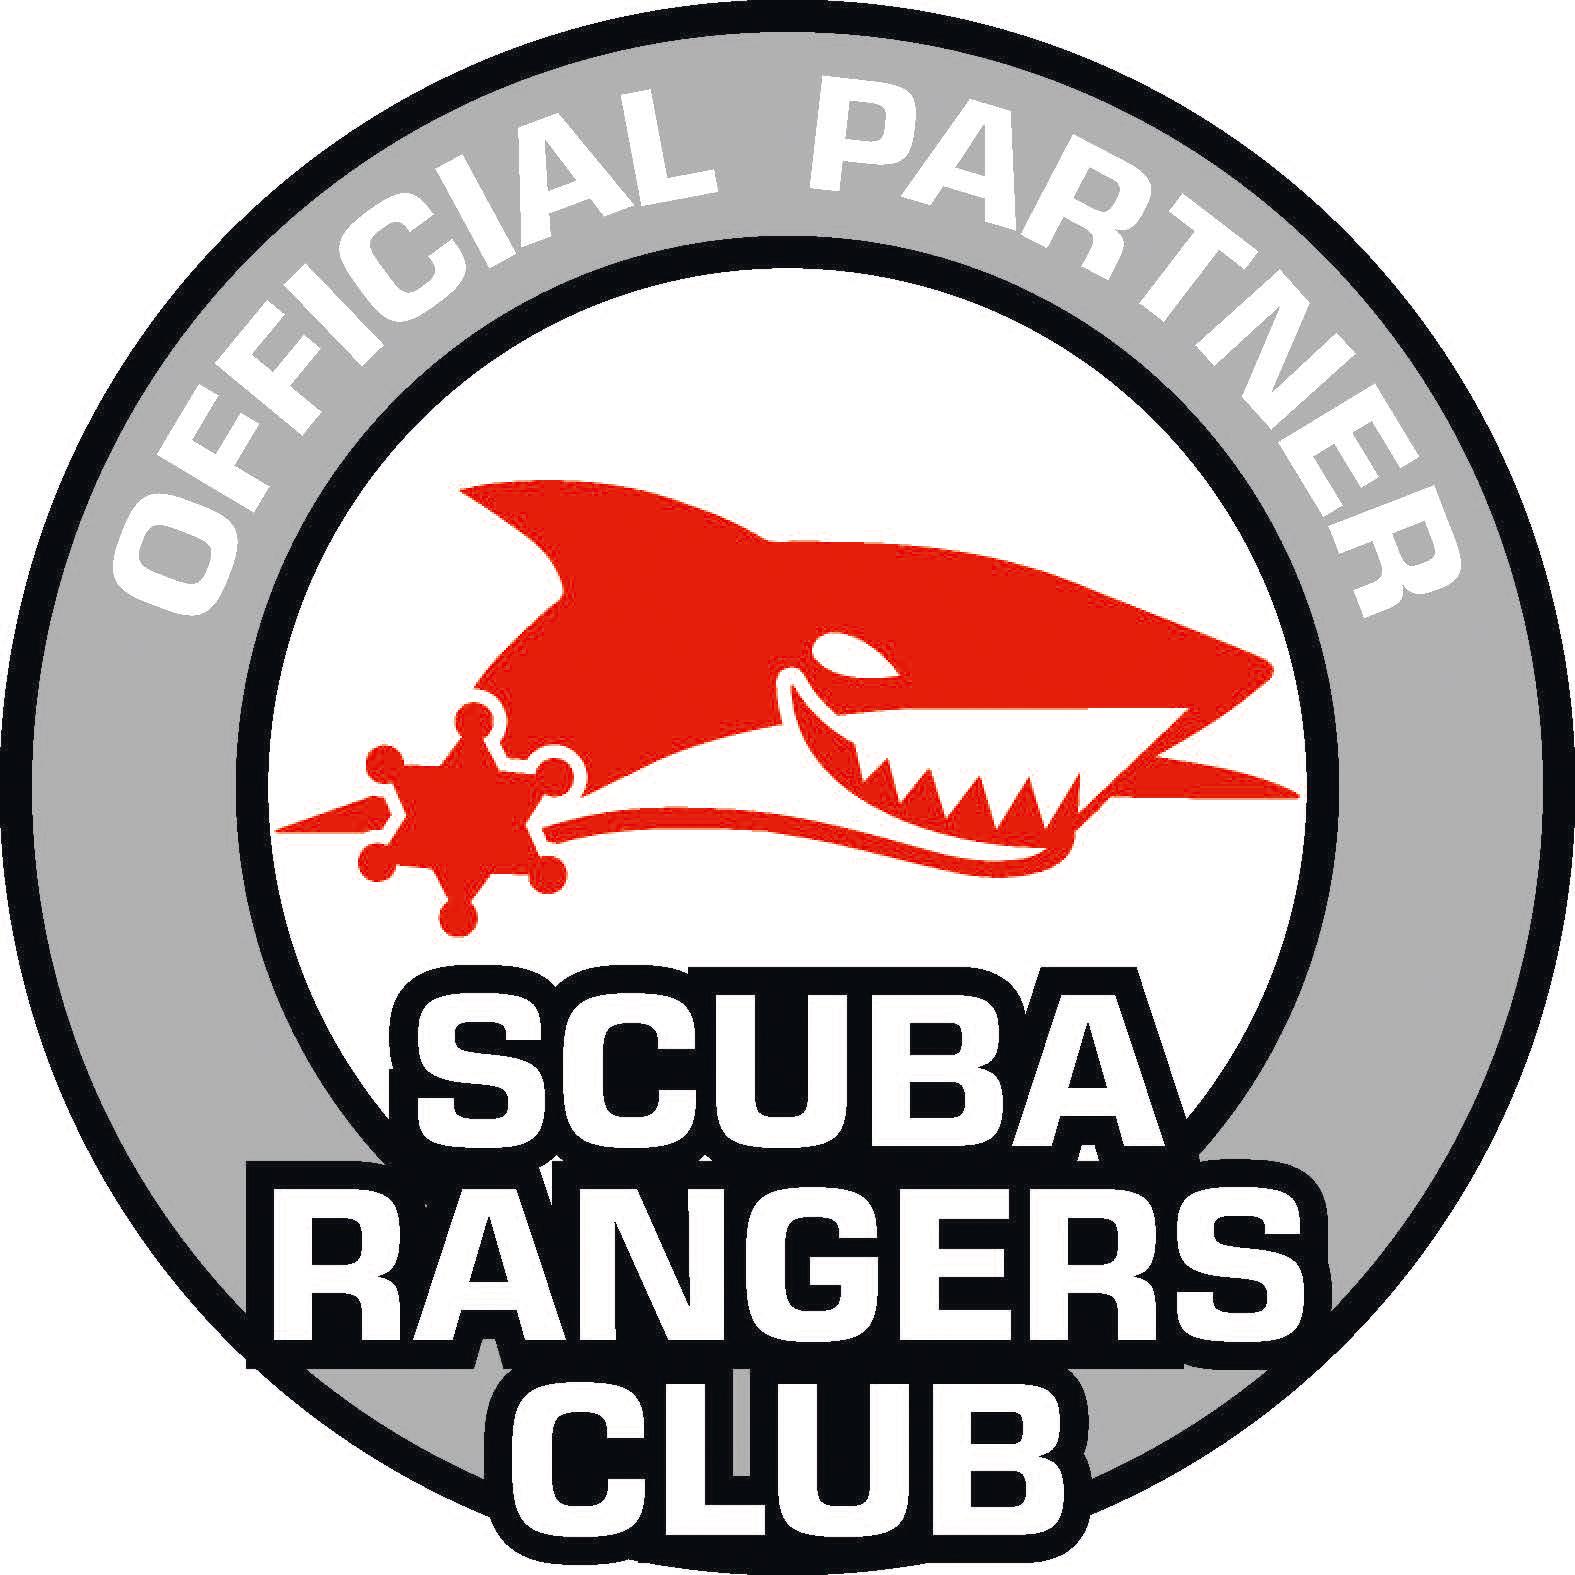 SSI Scuba Rangers Club